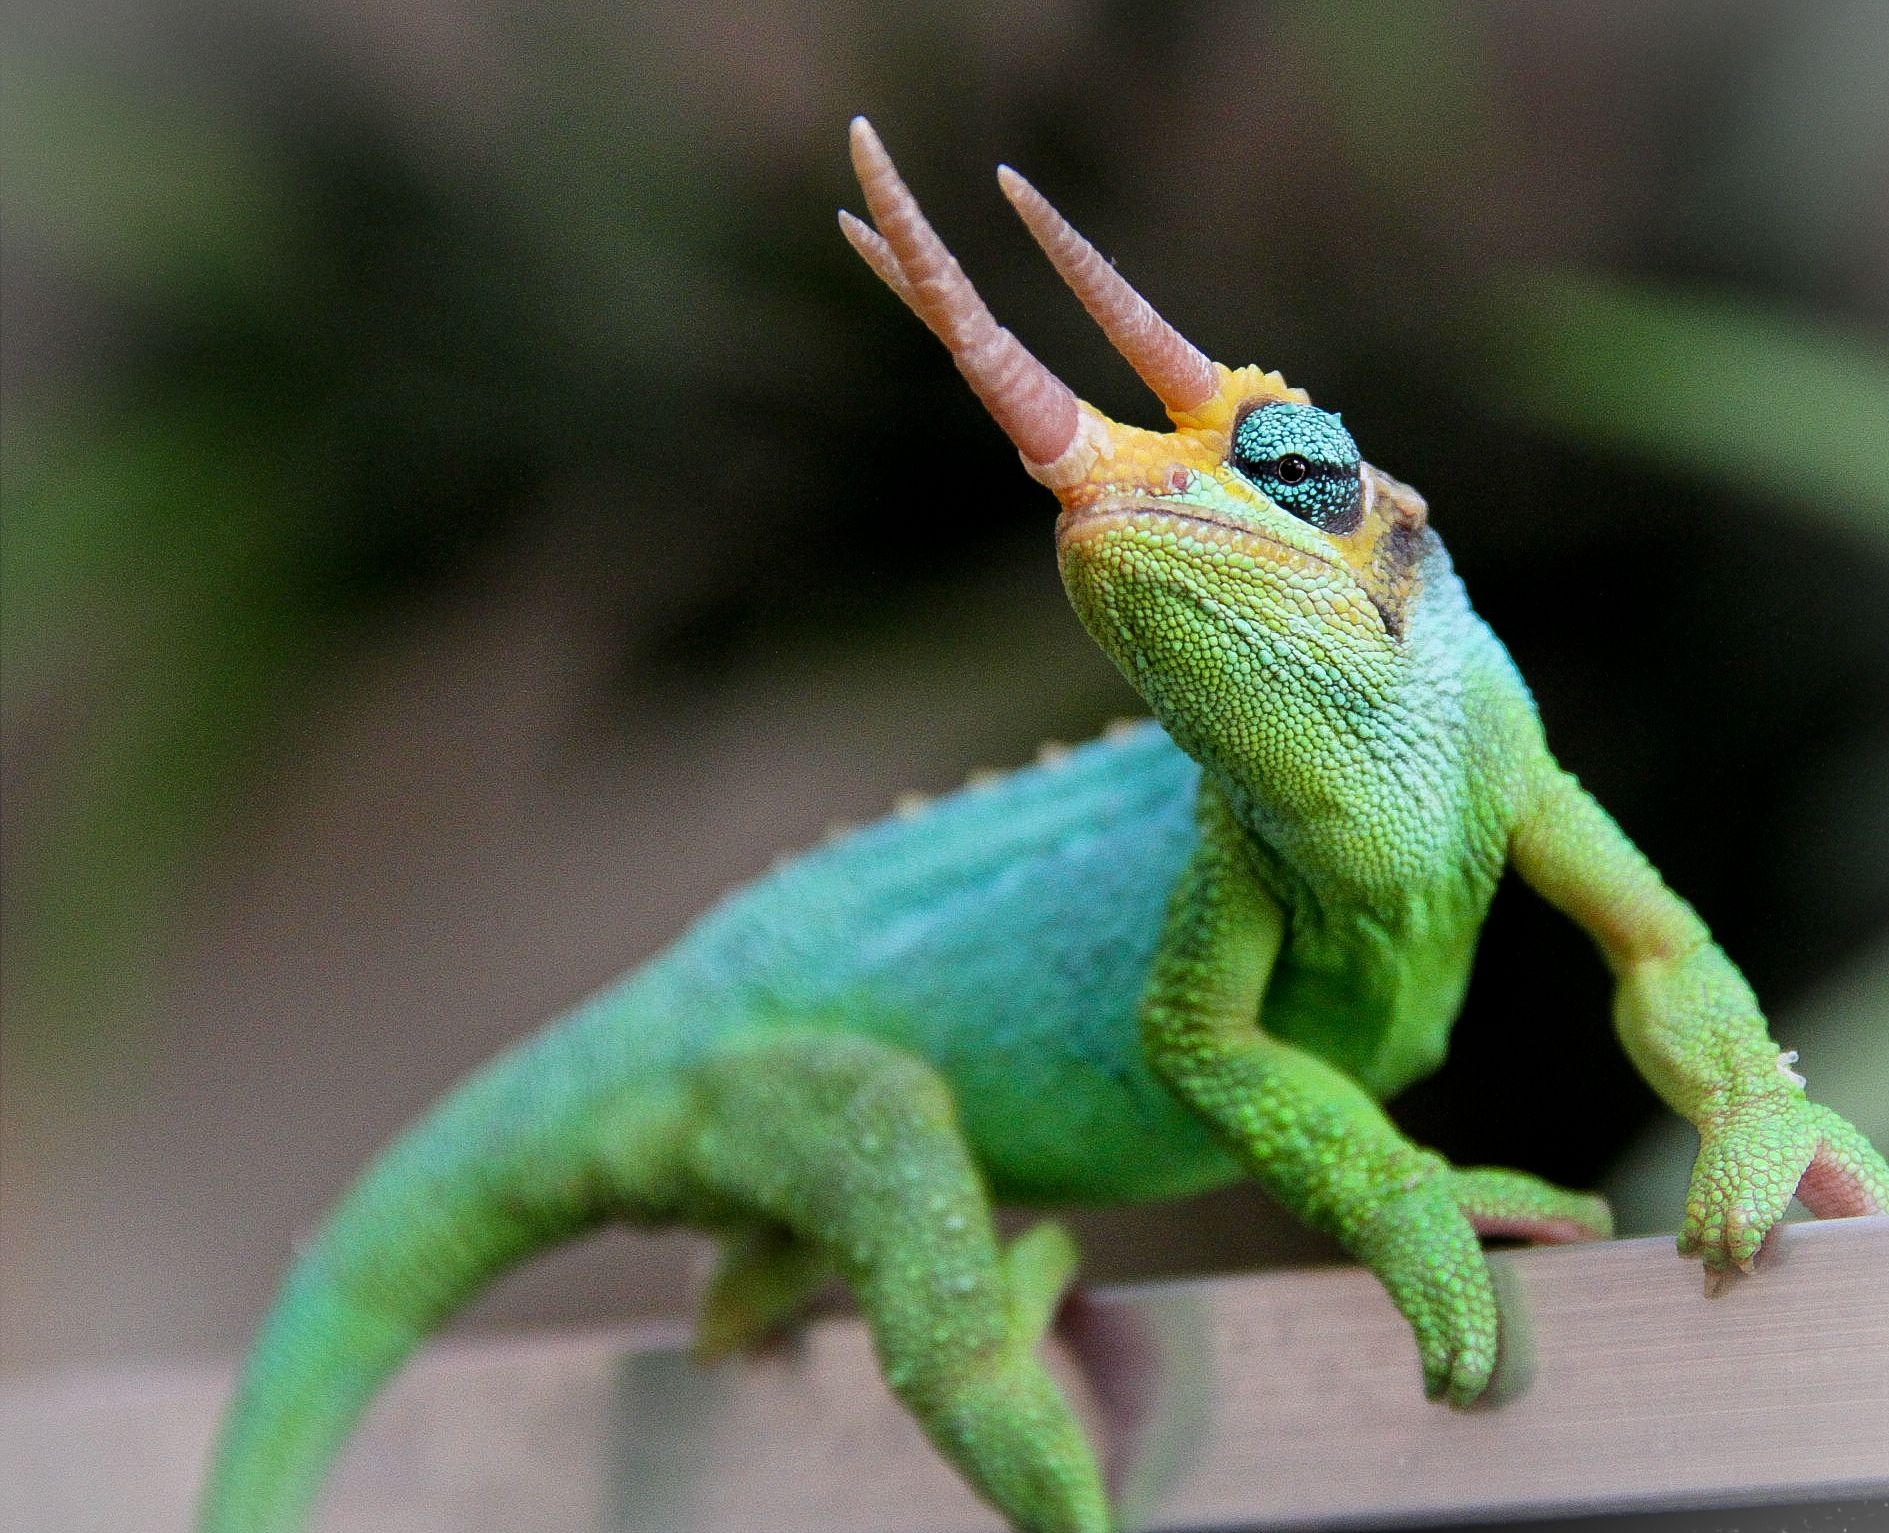 baby jackson chameleon - Google Search | Sweet animal ...